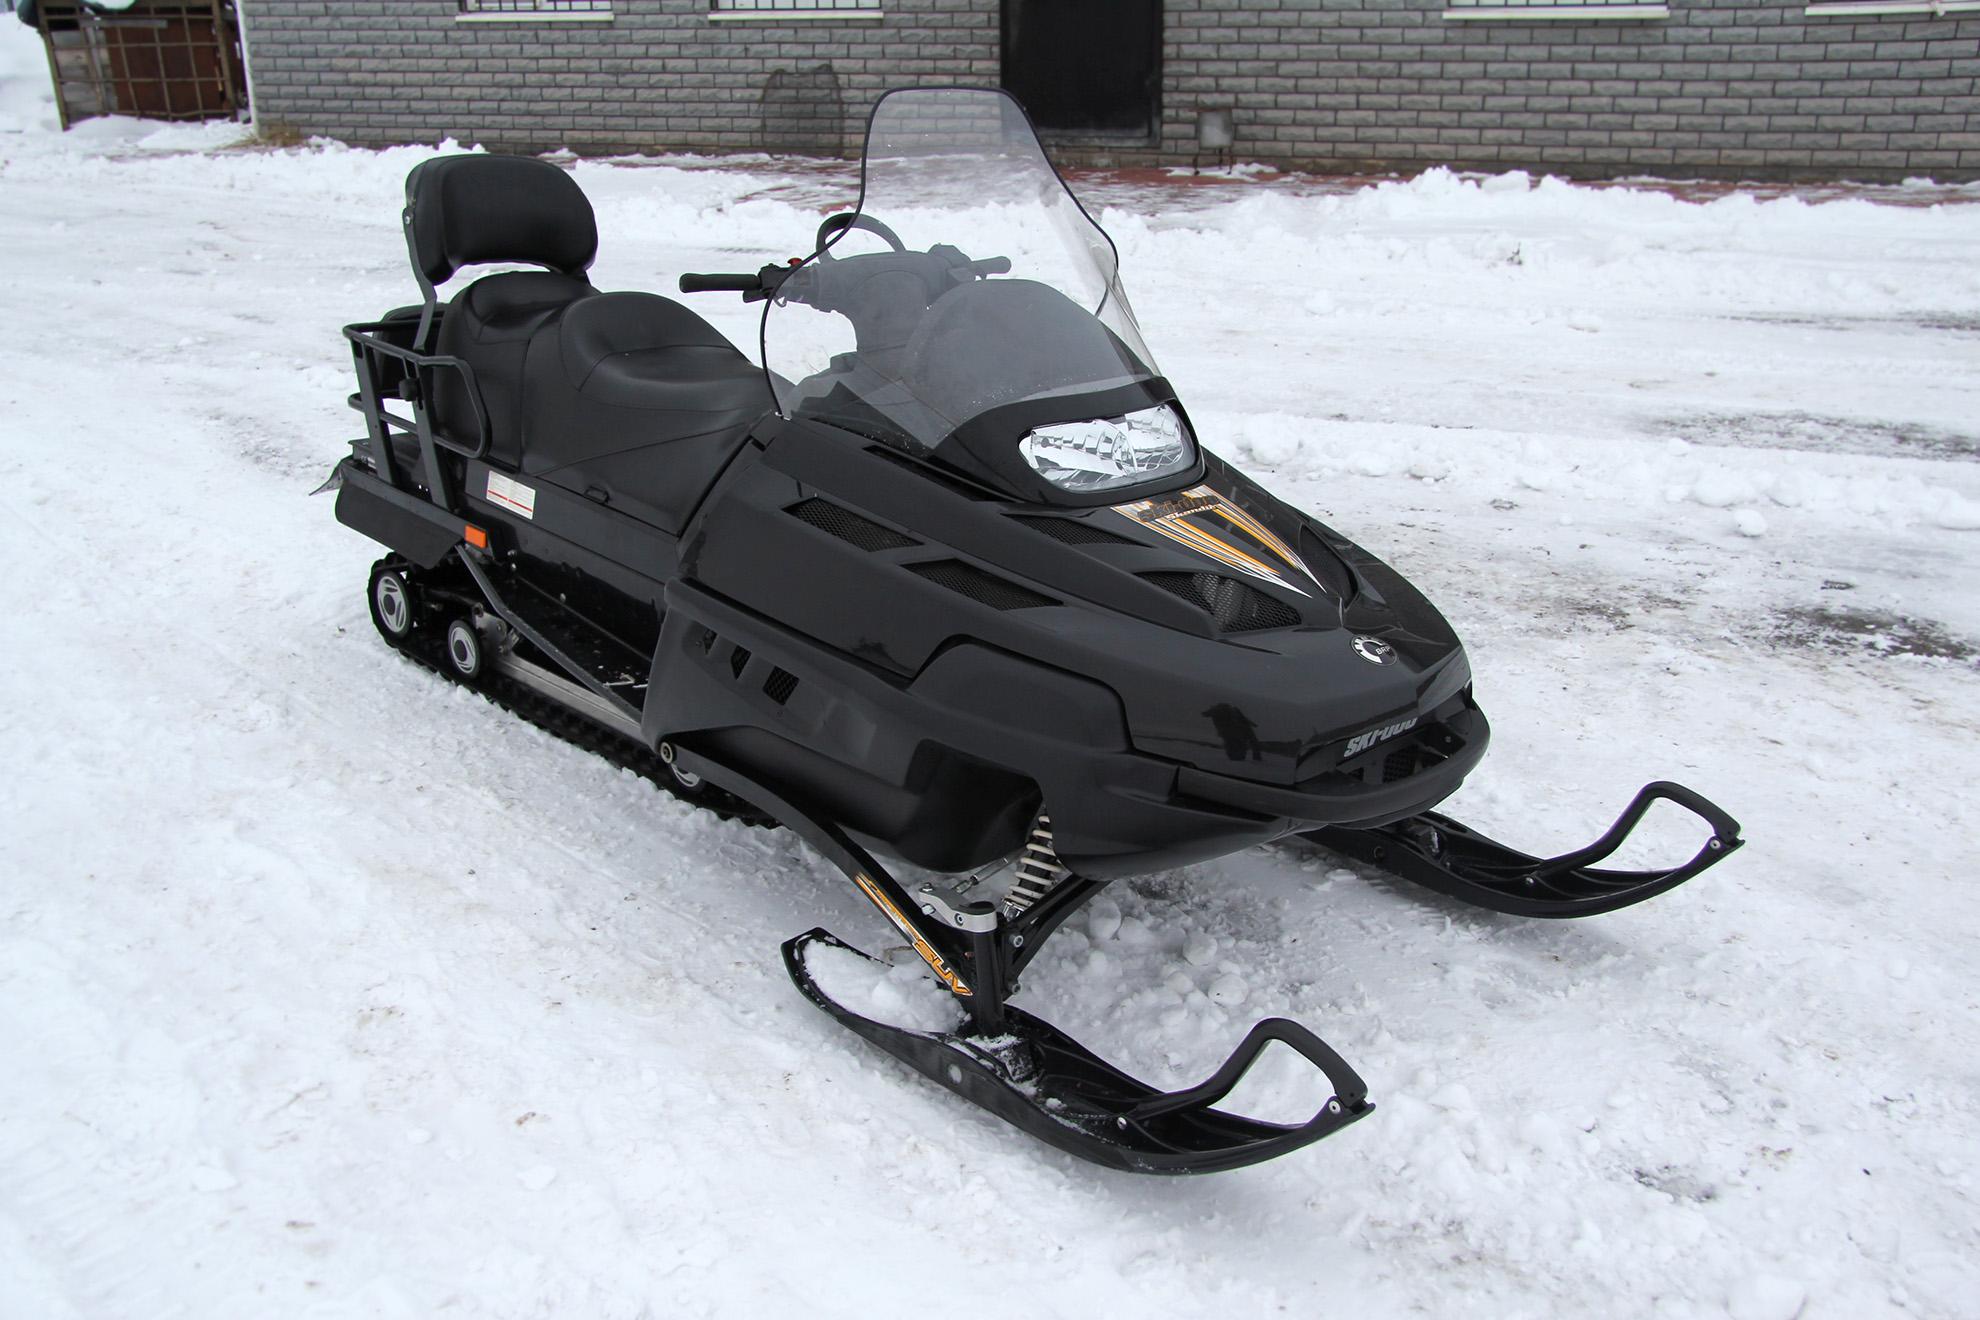 Brp Ski Doo Skandic Suv Www Snowmobile Ru Snegohodnyj